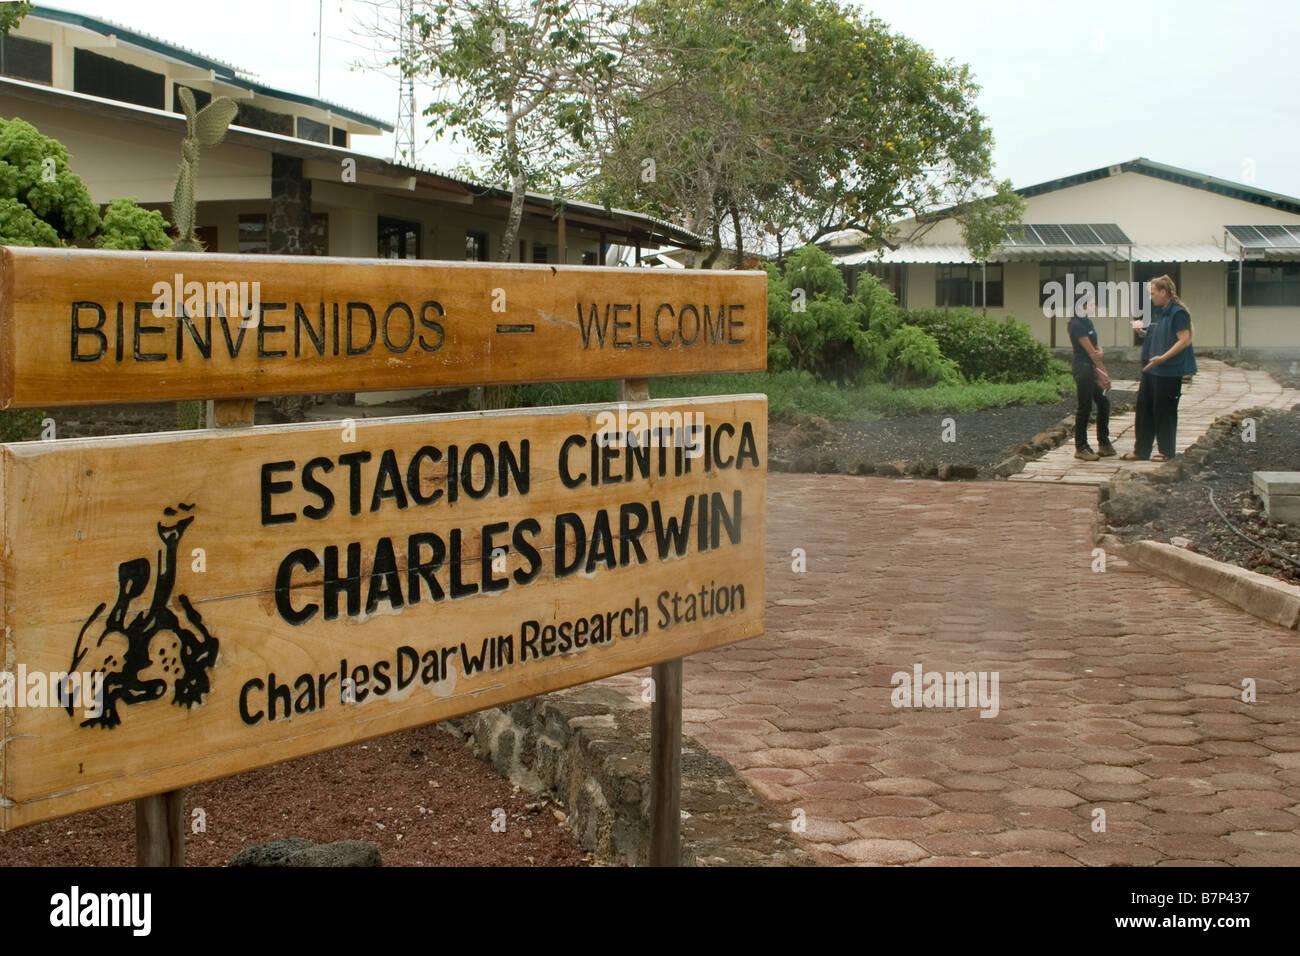 Ecuador Galapagos Santa Cruz Charles Darwin research station - Stock Image